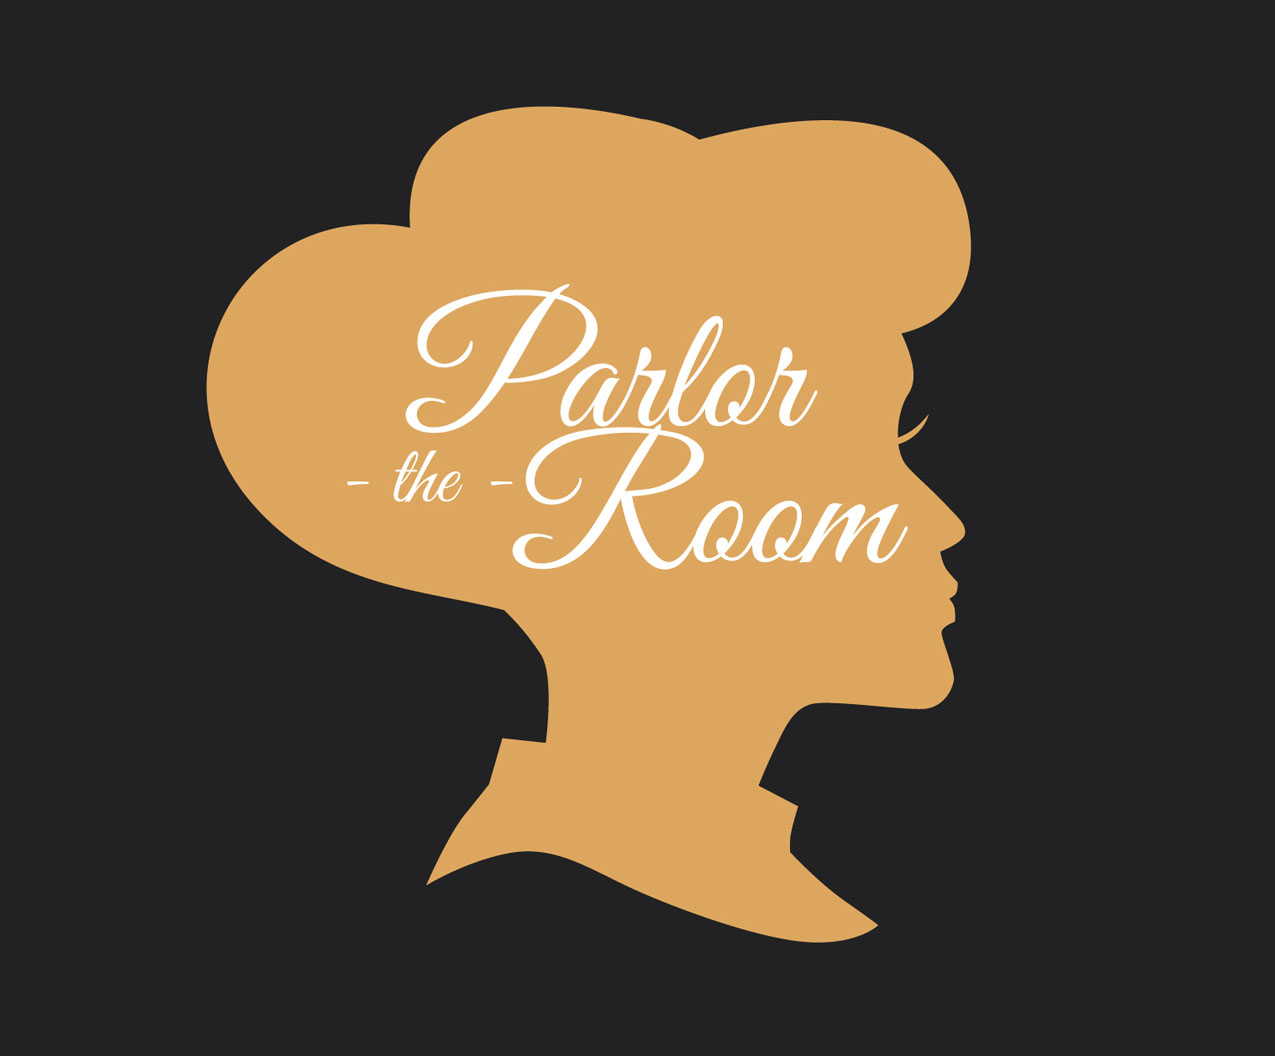 ParlorRoom_CROP